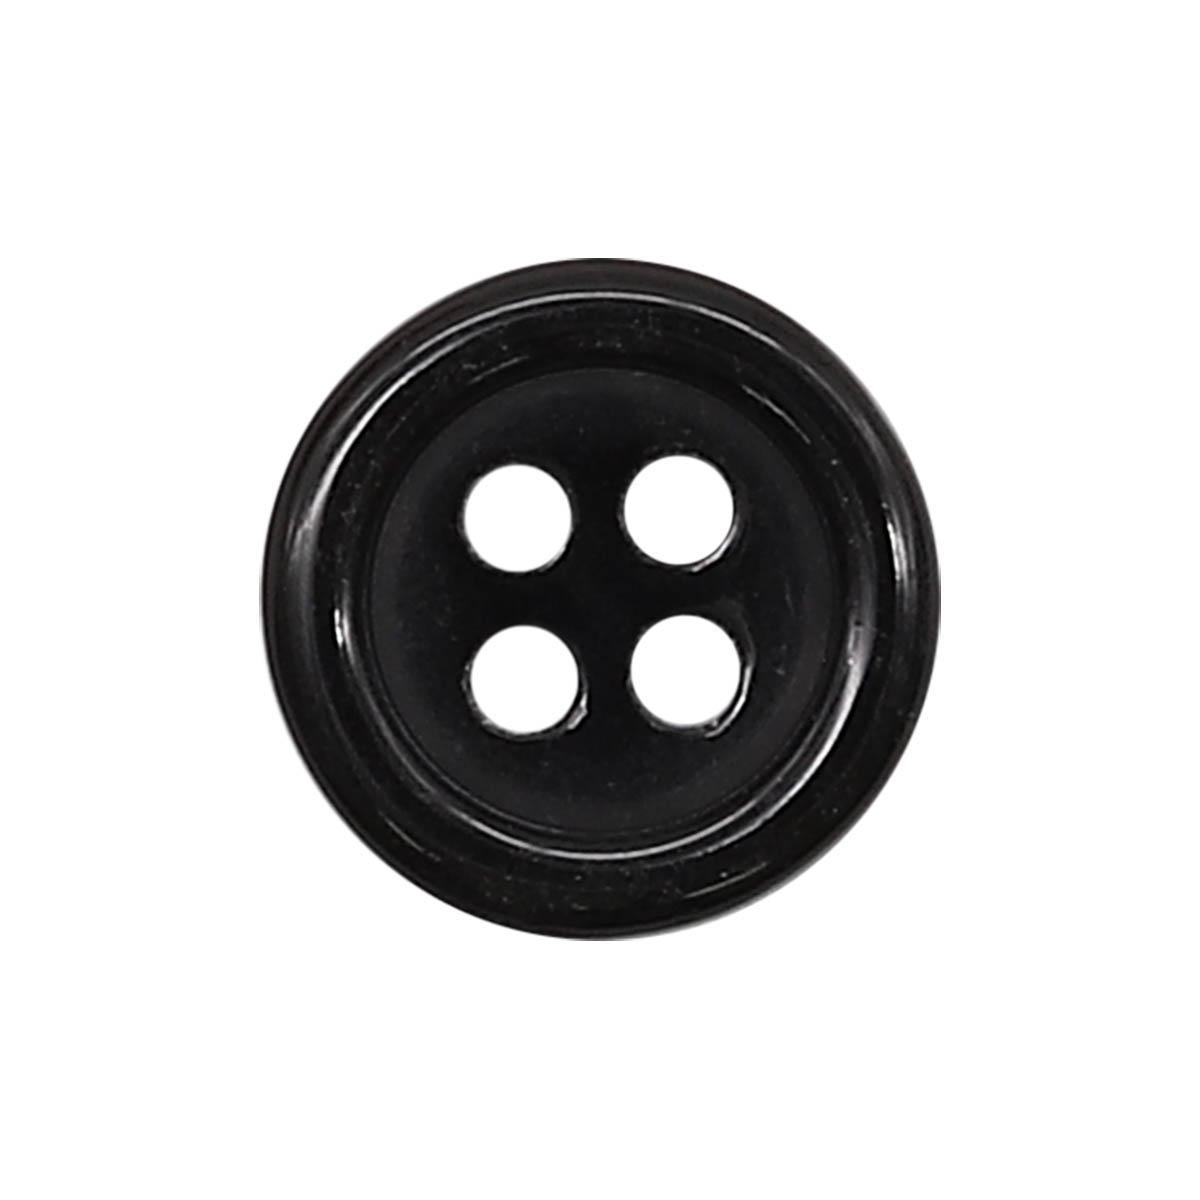 35483/4 18 (3500-53) Пуговица 4 прокола черн.глянц.полиэстер ГР